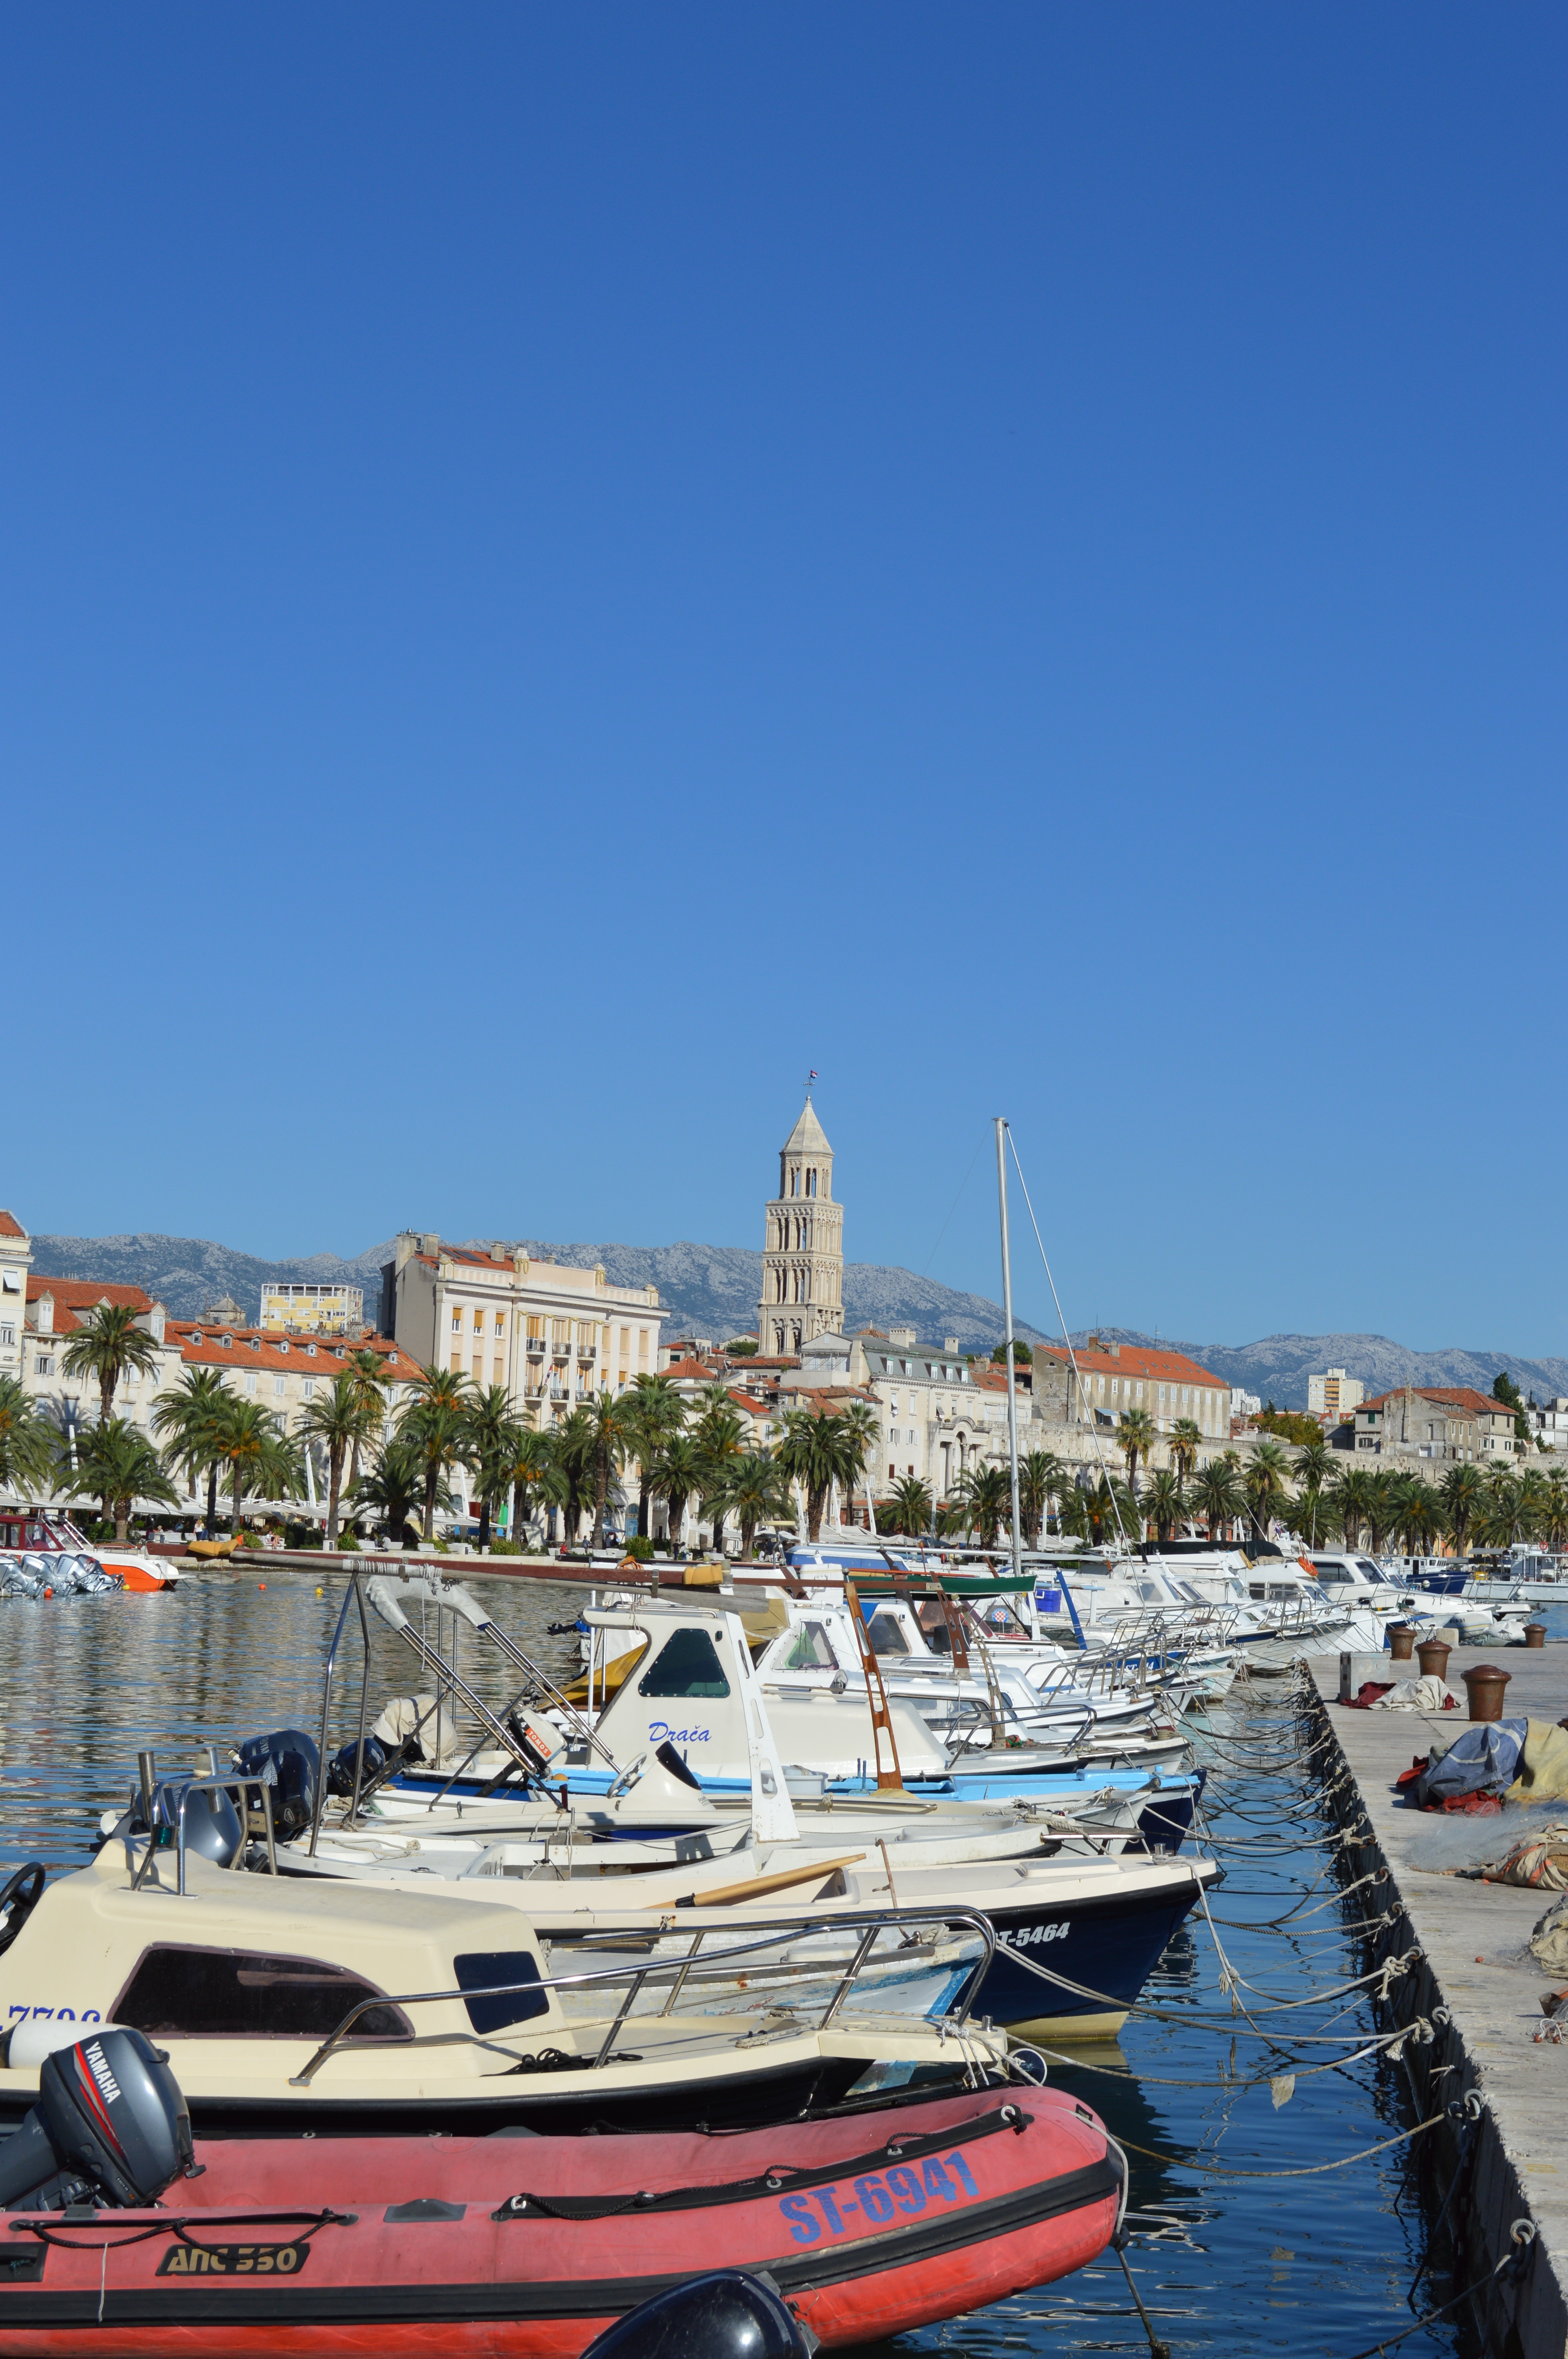 Split waterfront, Croatia - cultivatedrambler.com